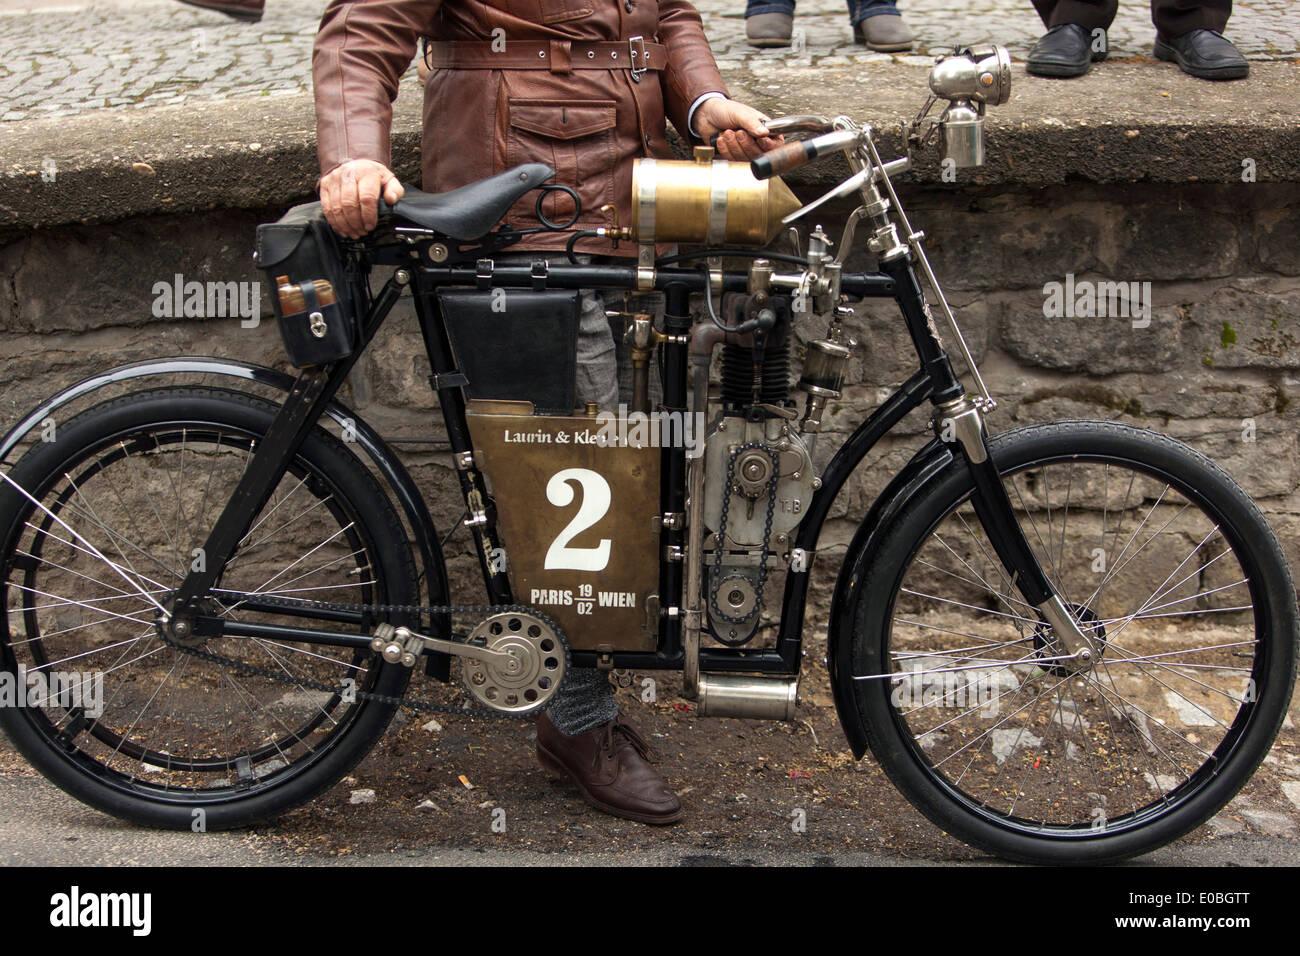 Veleran Oldtimer Vintage Motorcycle Laurin Klement 1902 Austro-Hungarian product - Stock Image